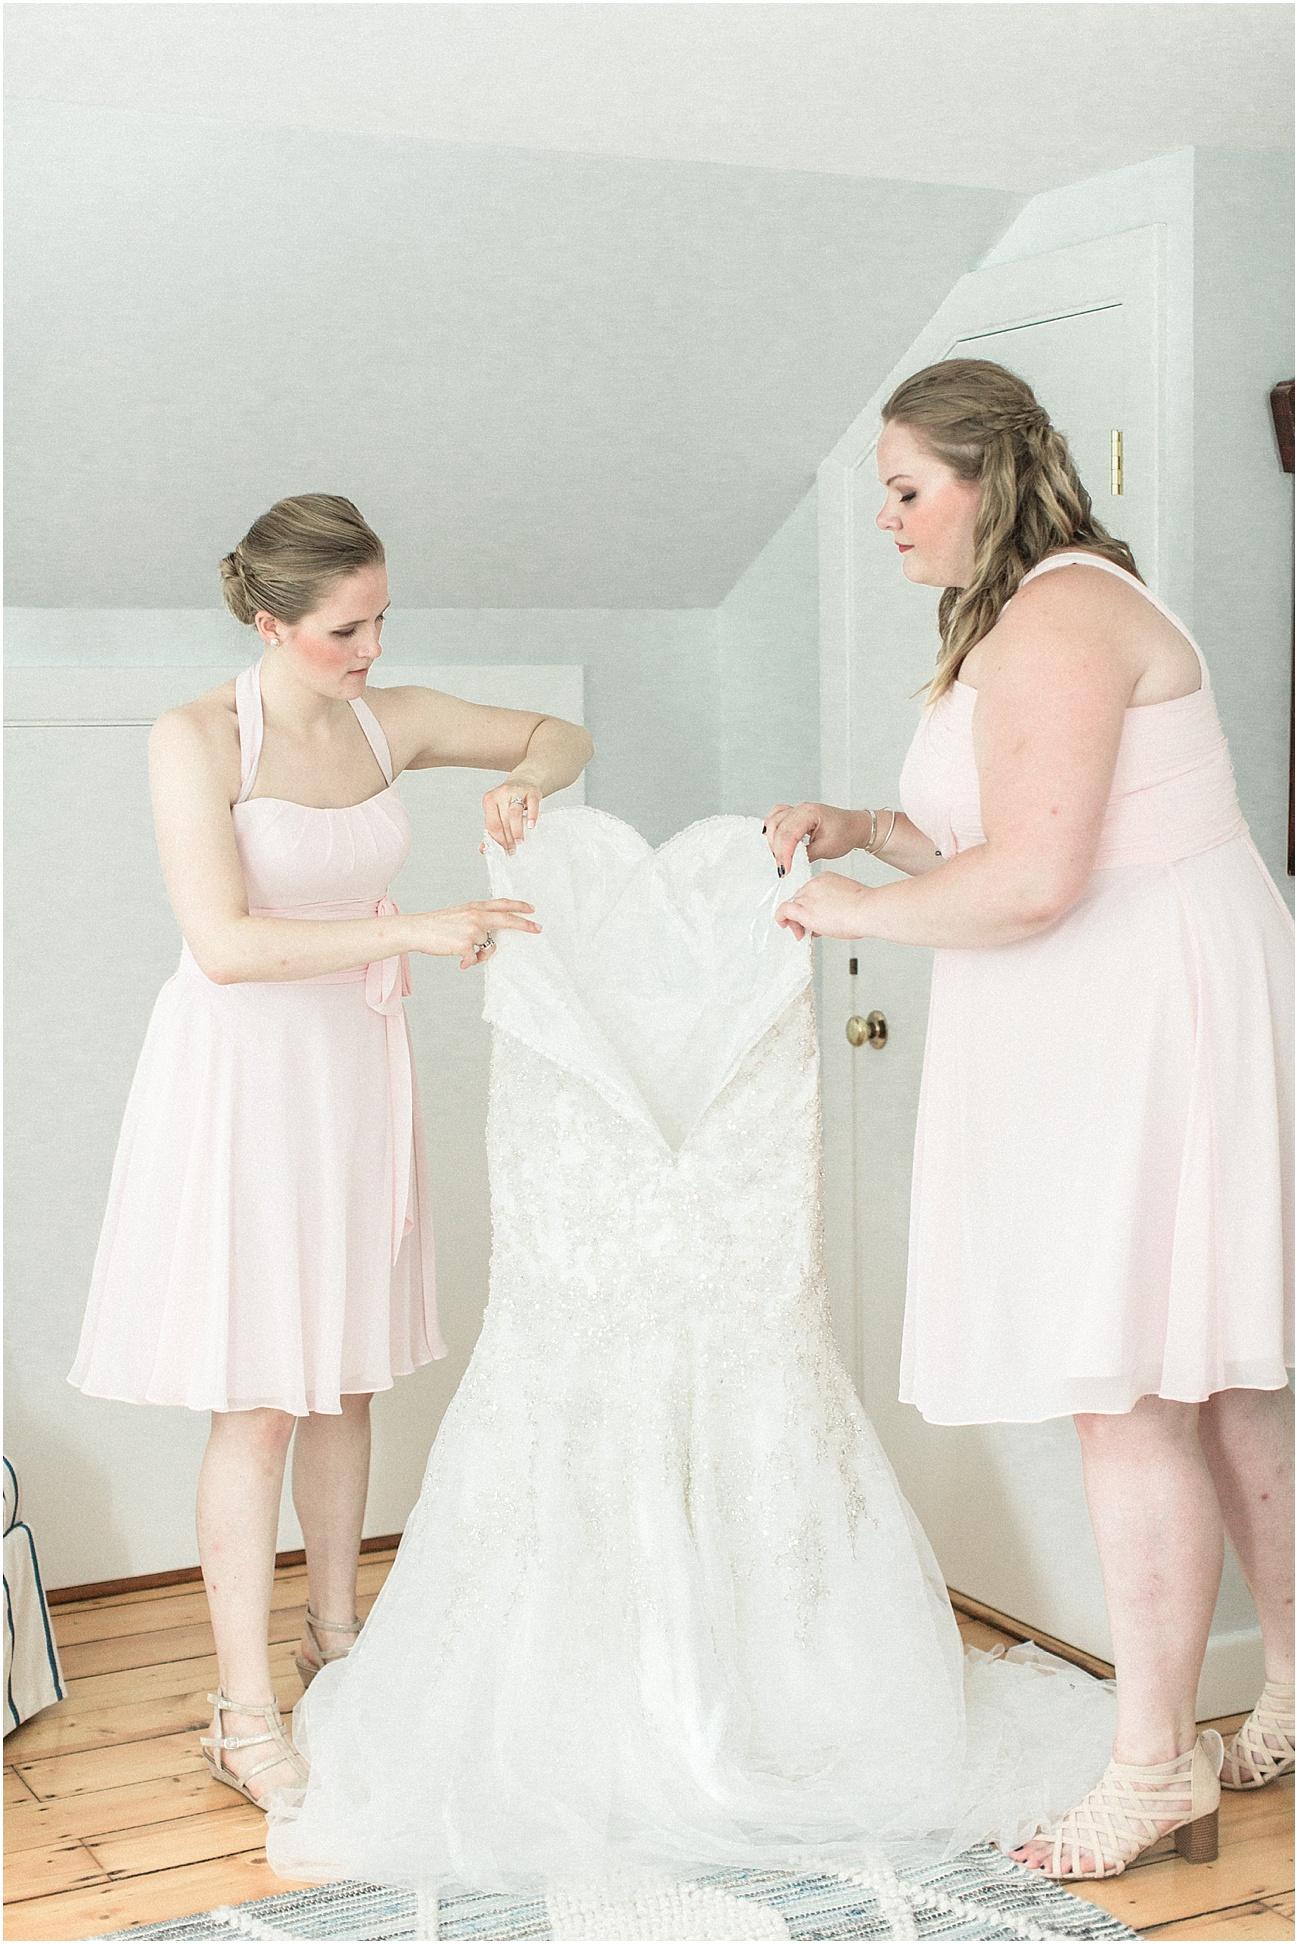 kati_bryan_maskell_white_cliffs_country_club_cape_cod_boston_wedding_photographer_meredith_jane_photography_photo_0471.jpg